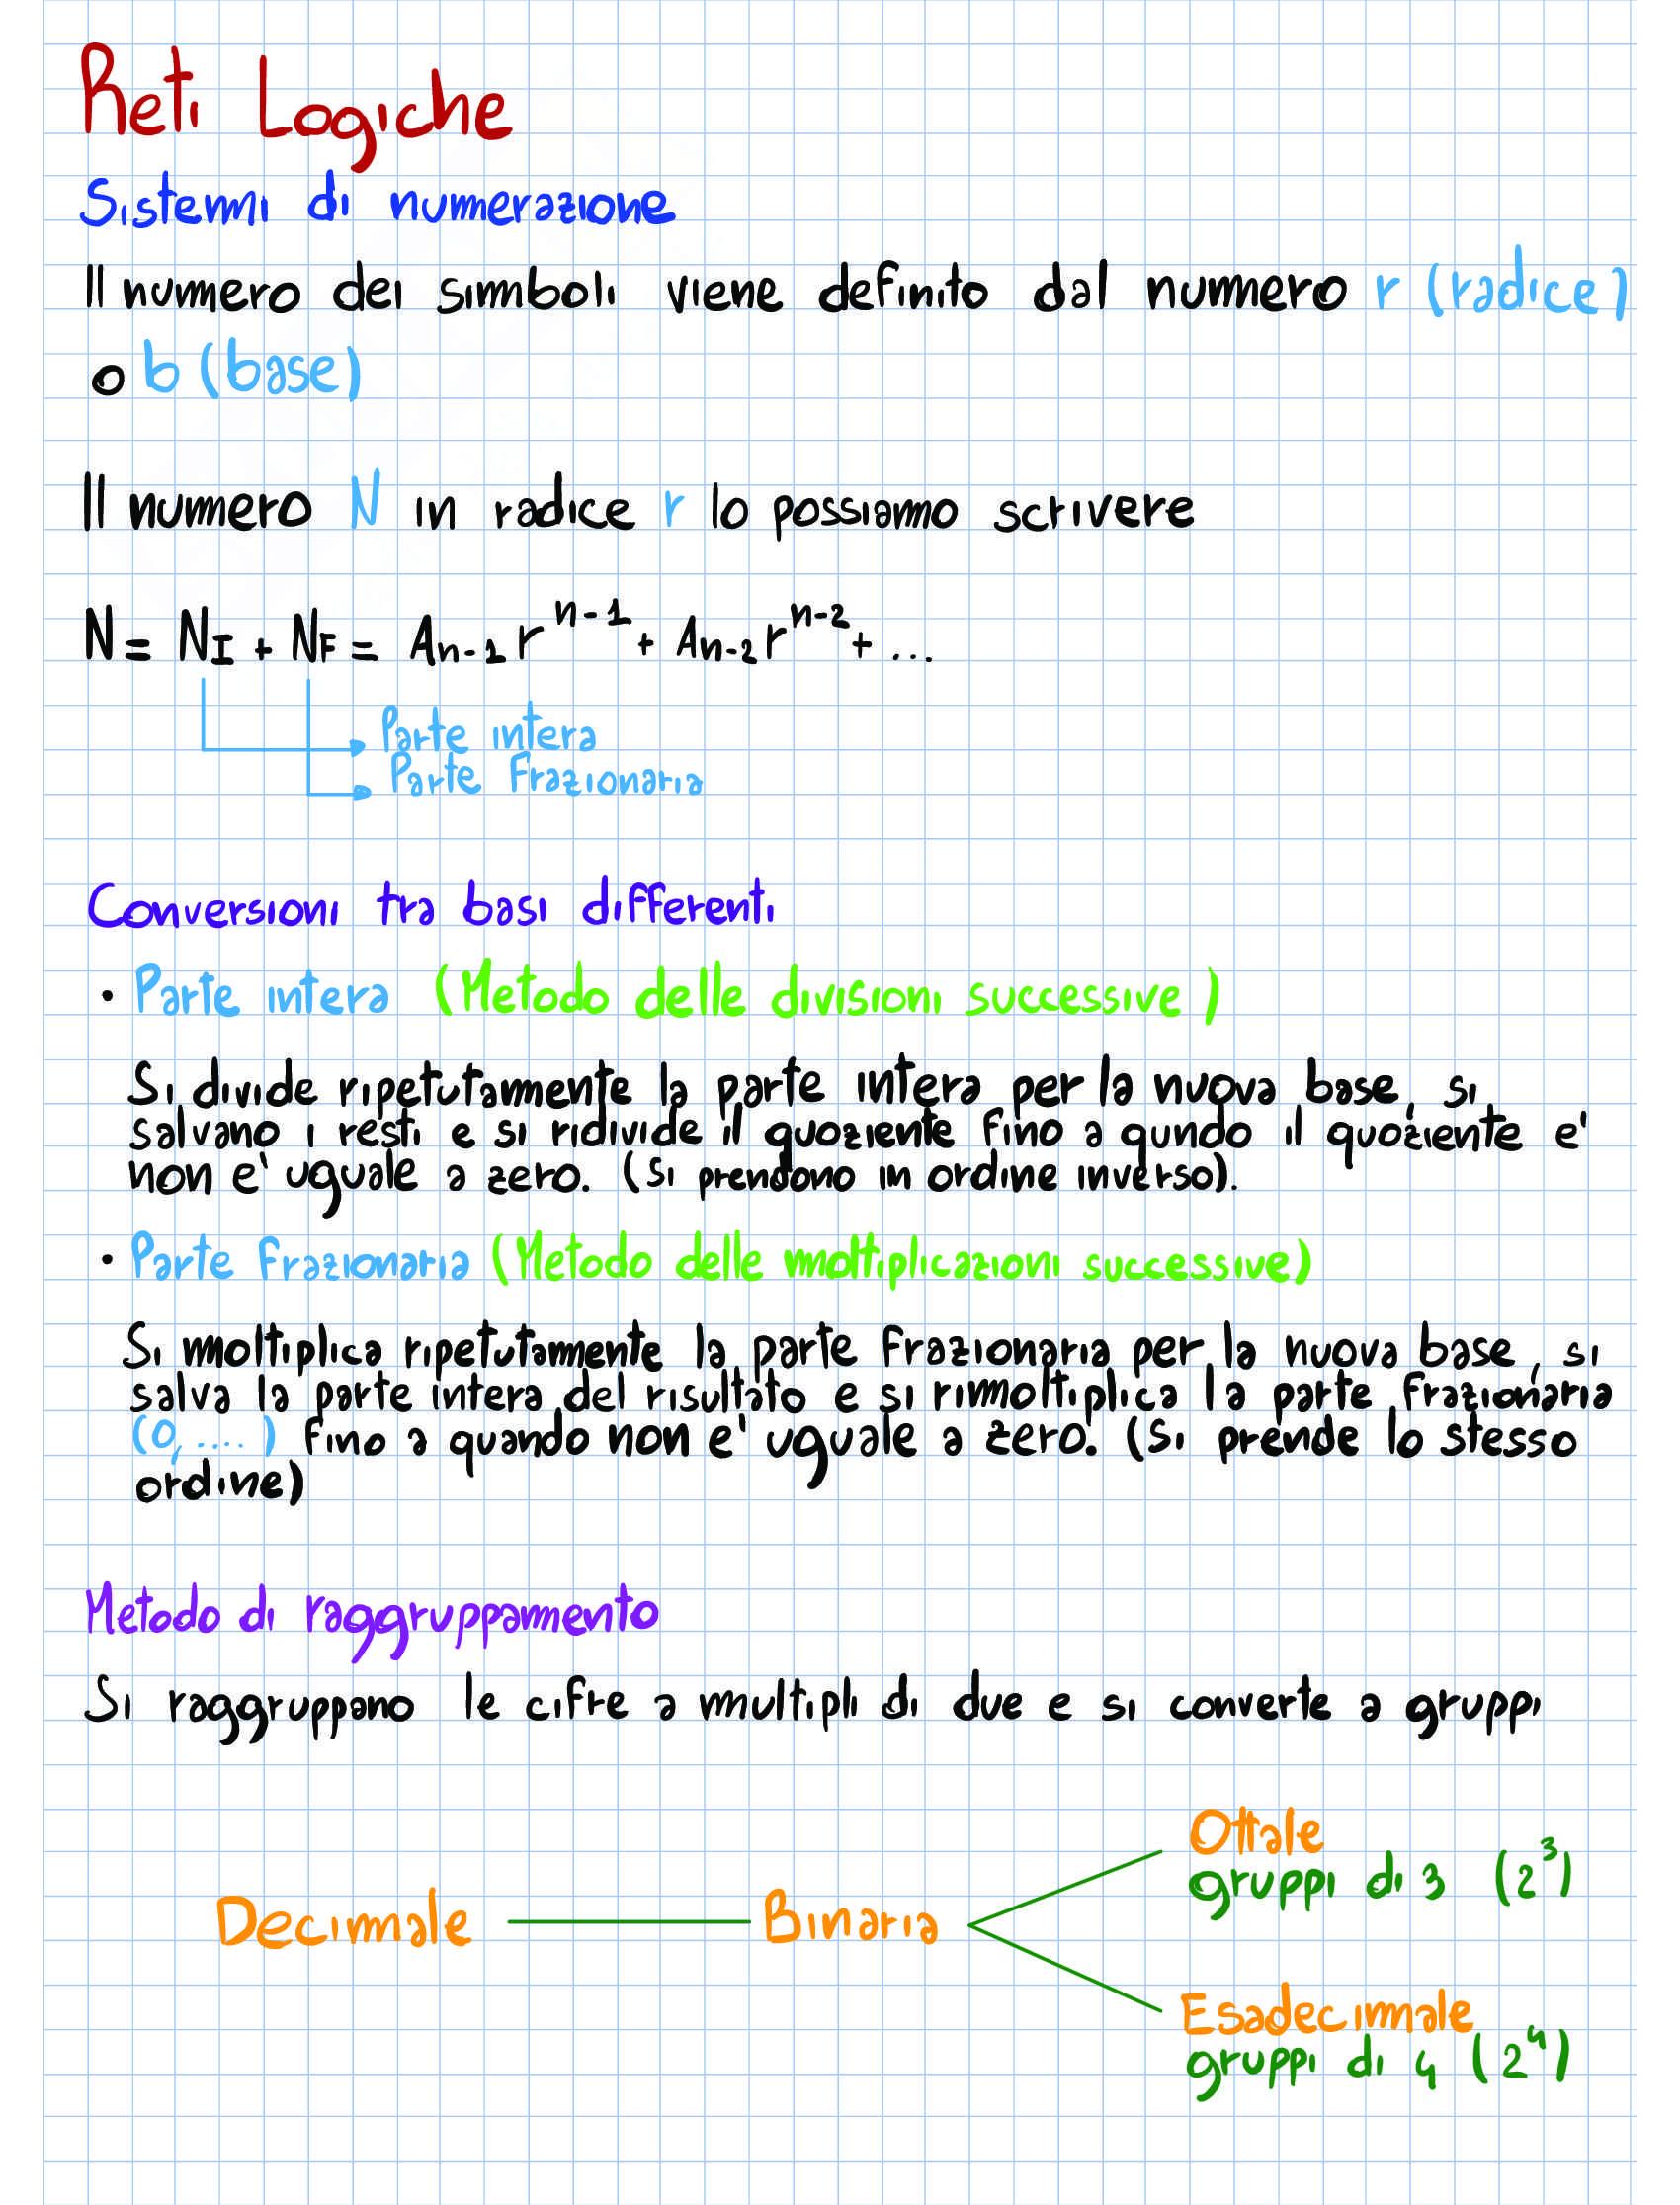 Reti Logiche - Appunti/Riassunti (iPad)